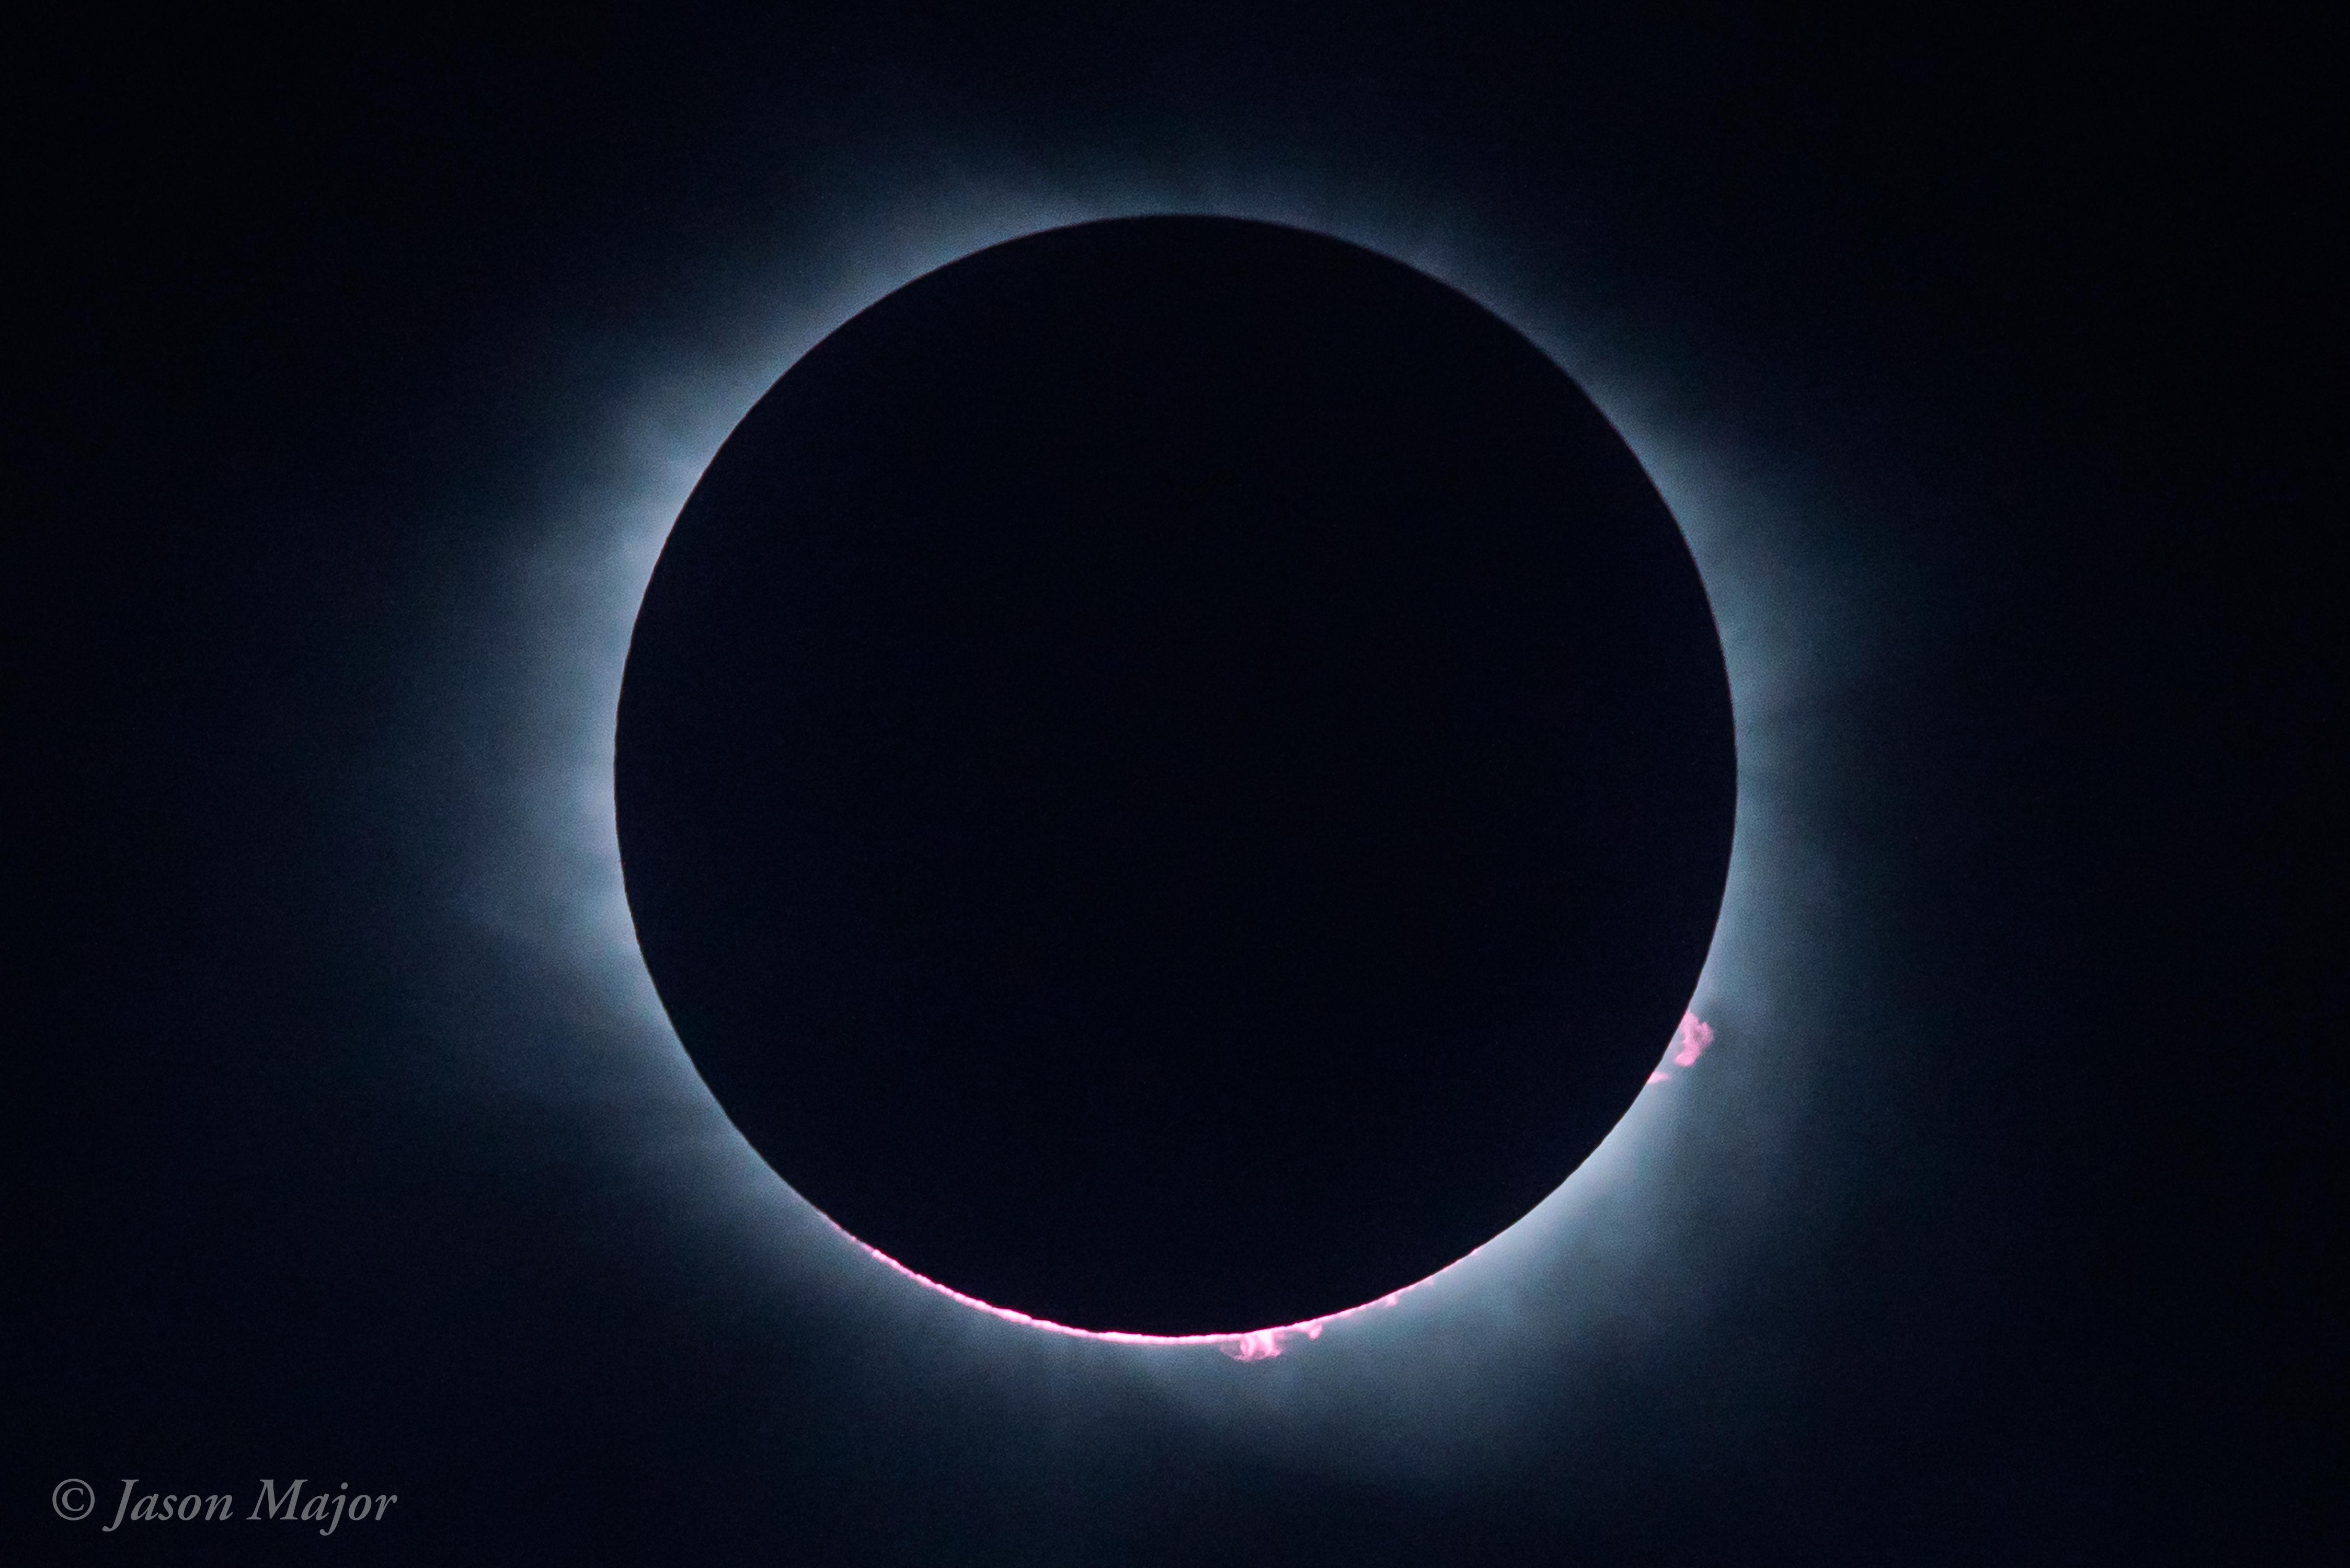 Black Hole Sun: Photos of a Total Solar Eclipse | Lights ...